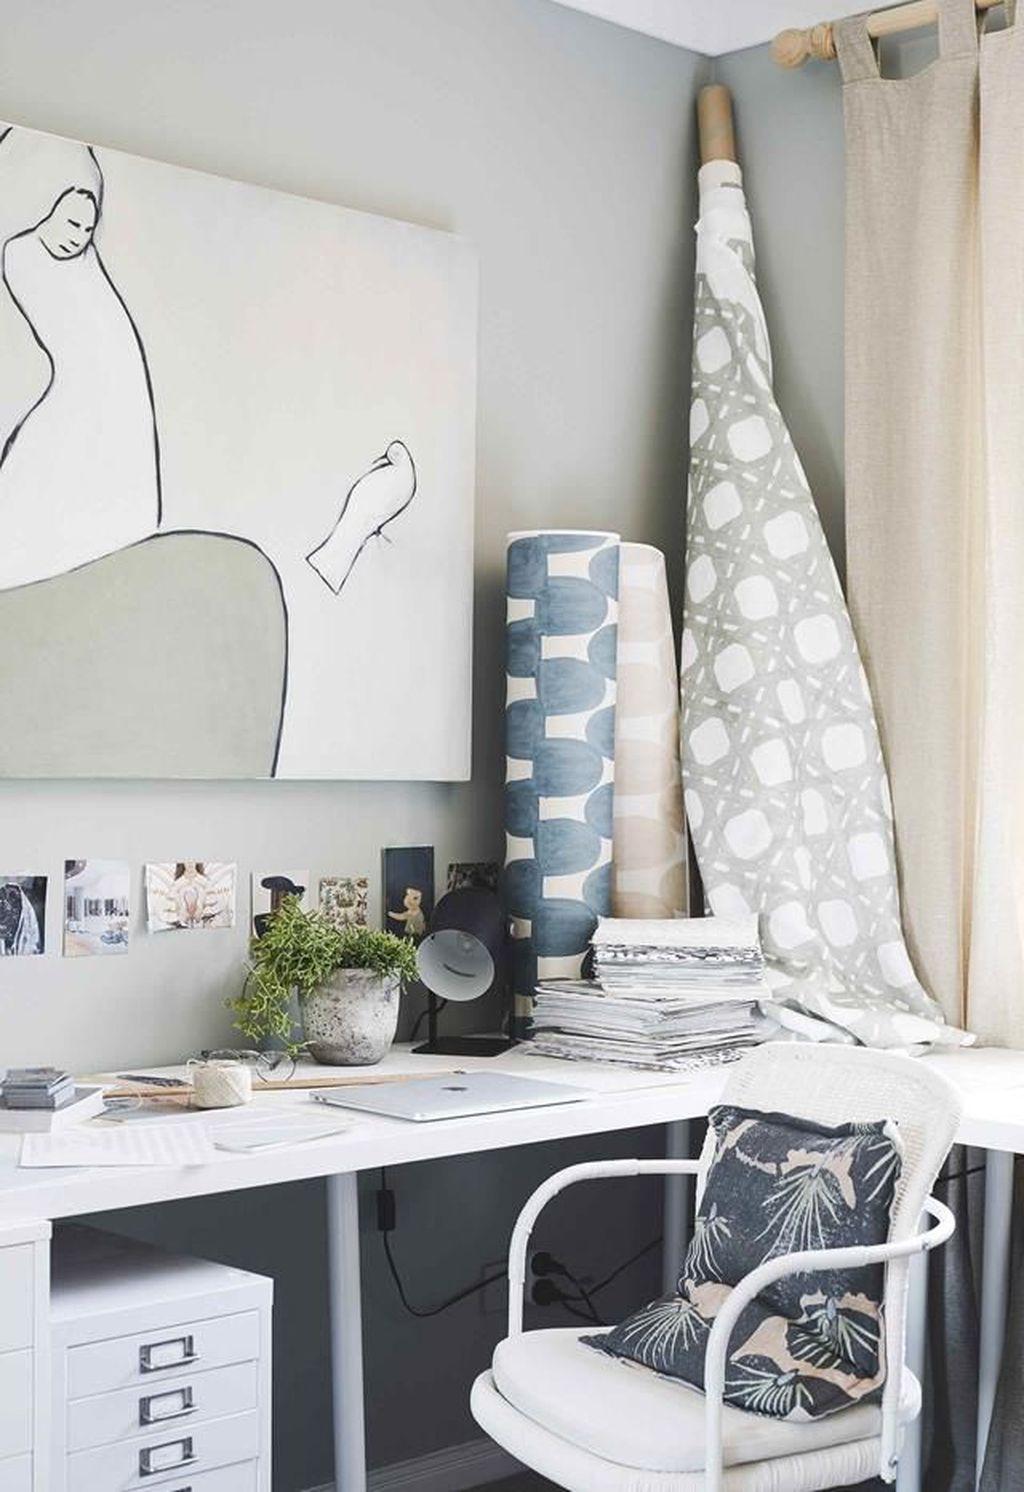 The Best Office Artwork Design Ideas 12